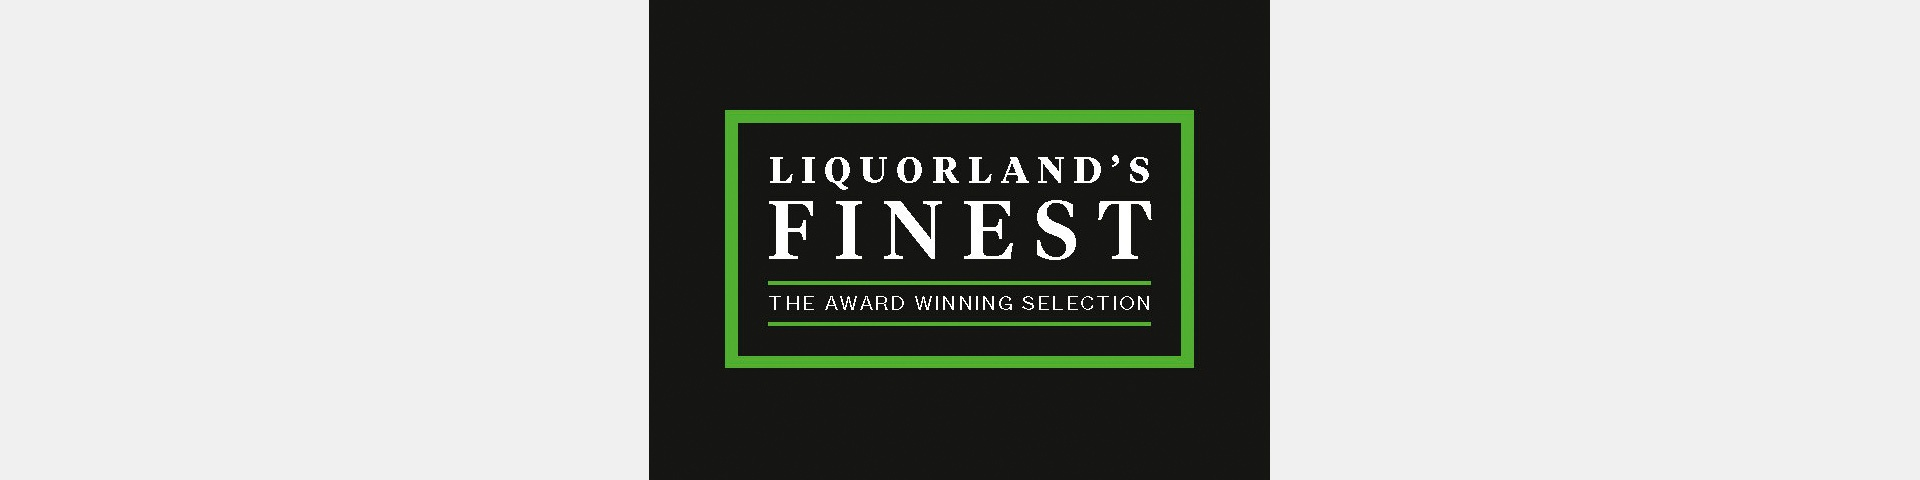 Liquorland's Finest